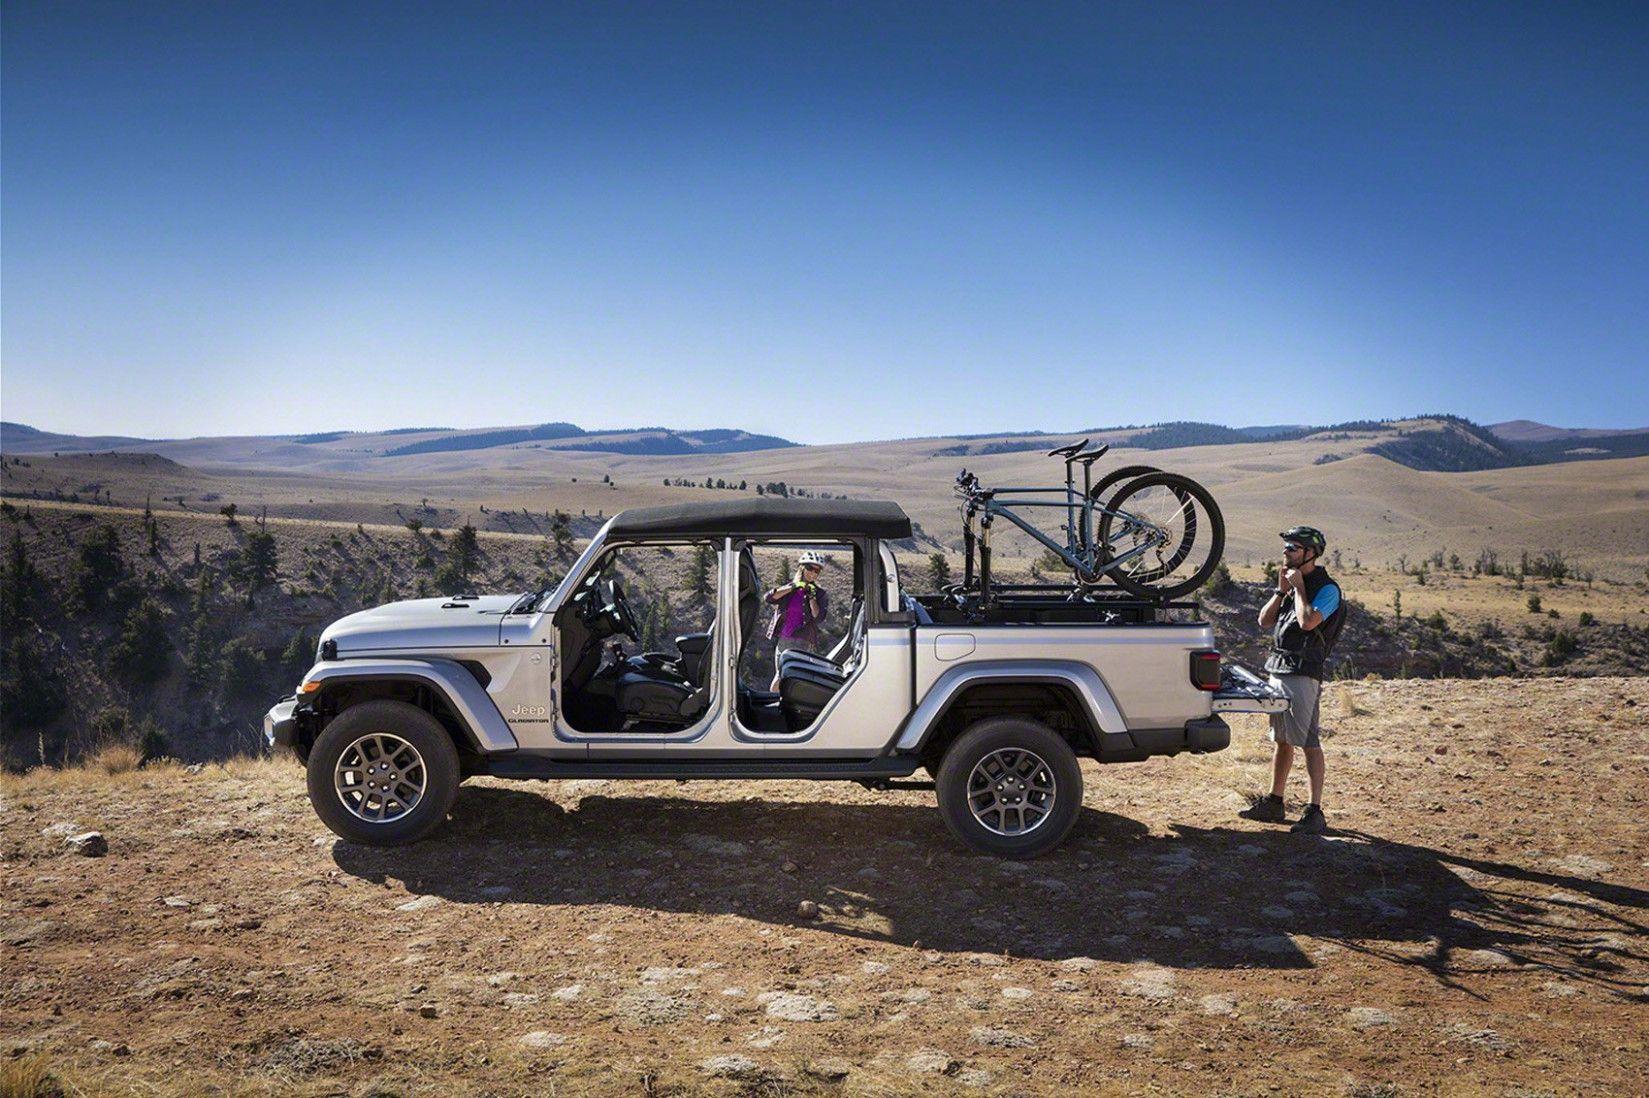 Mercedes Jeep 2020 Uk Research New In 2020 Jeep Gladiator Wrangler Pickup Wrangler Truck